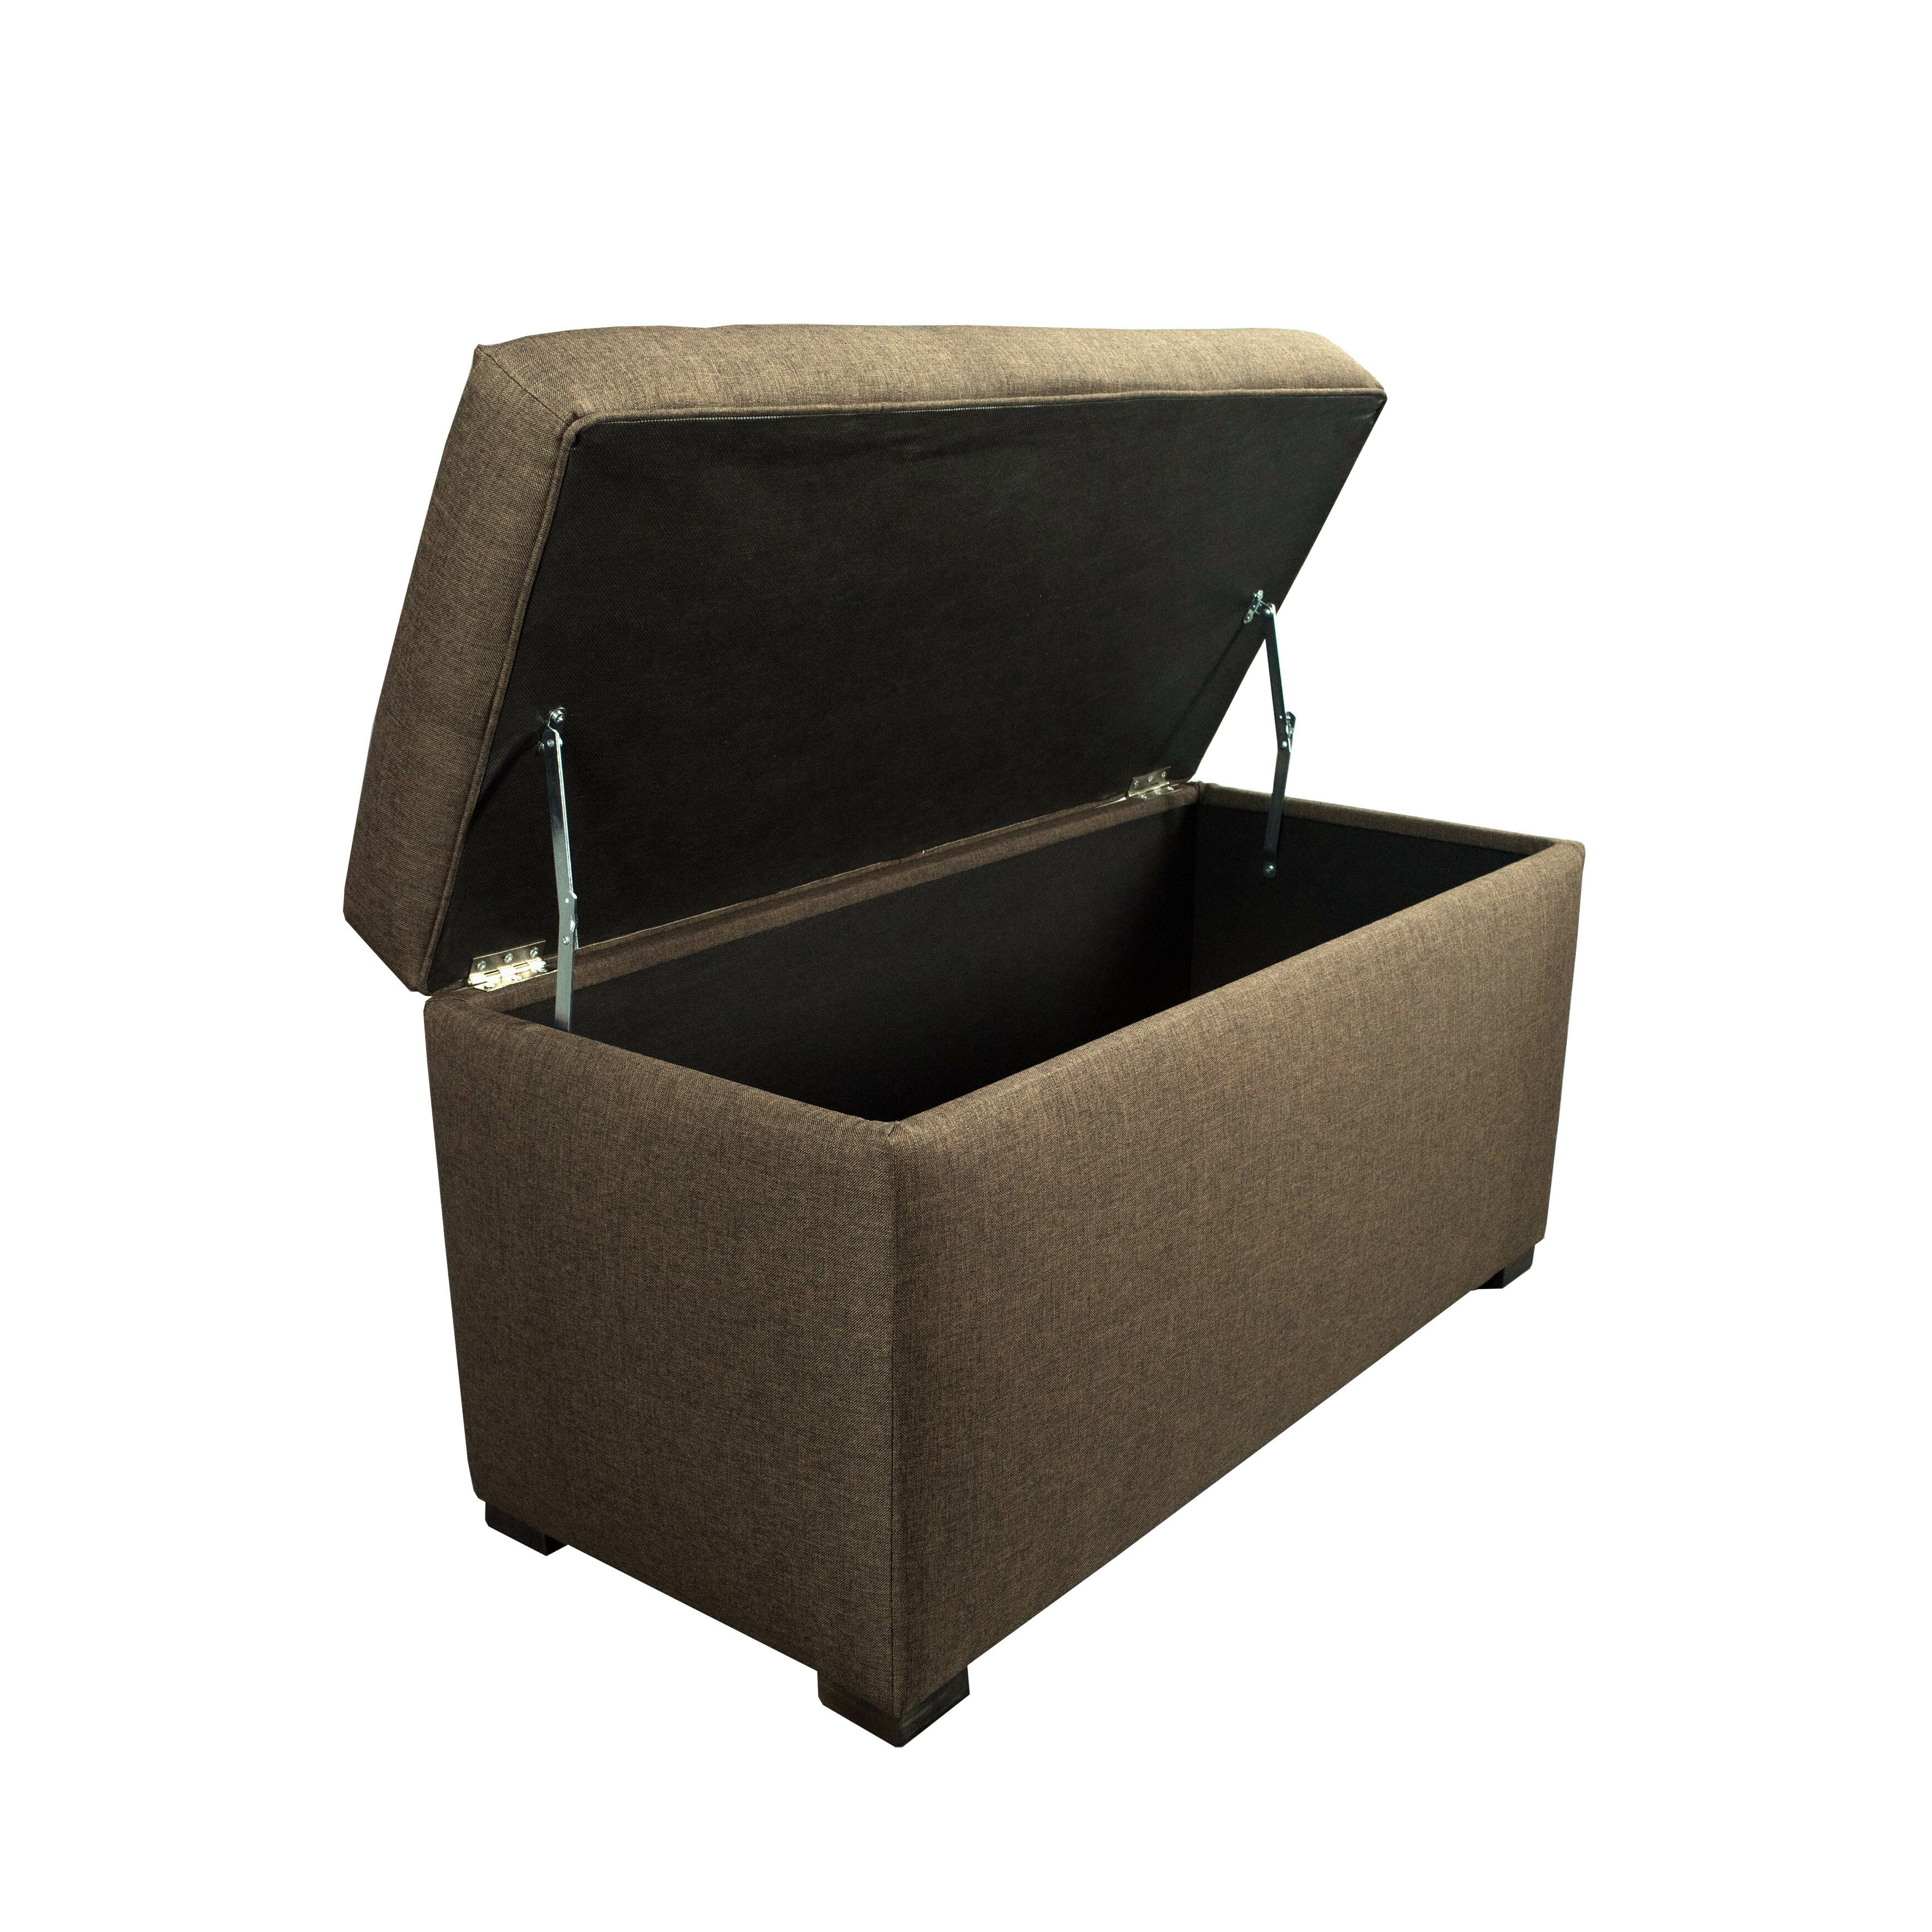 Mjlfurniture Angela Sand Storage Trunk Bench Reviews Wayfair